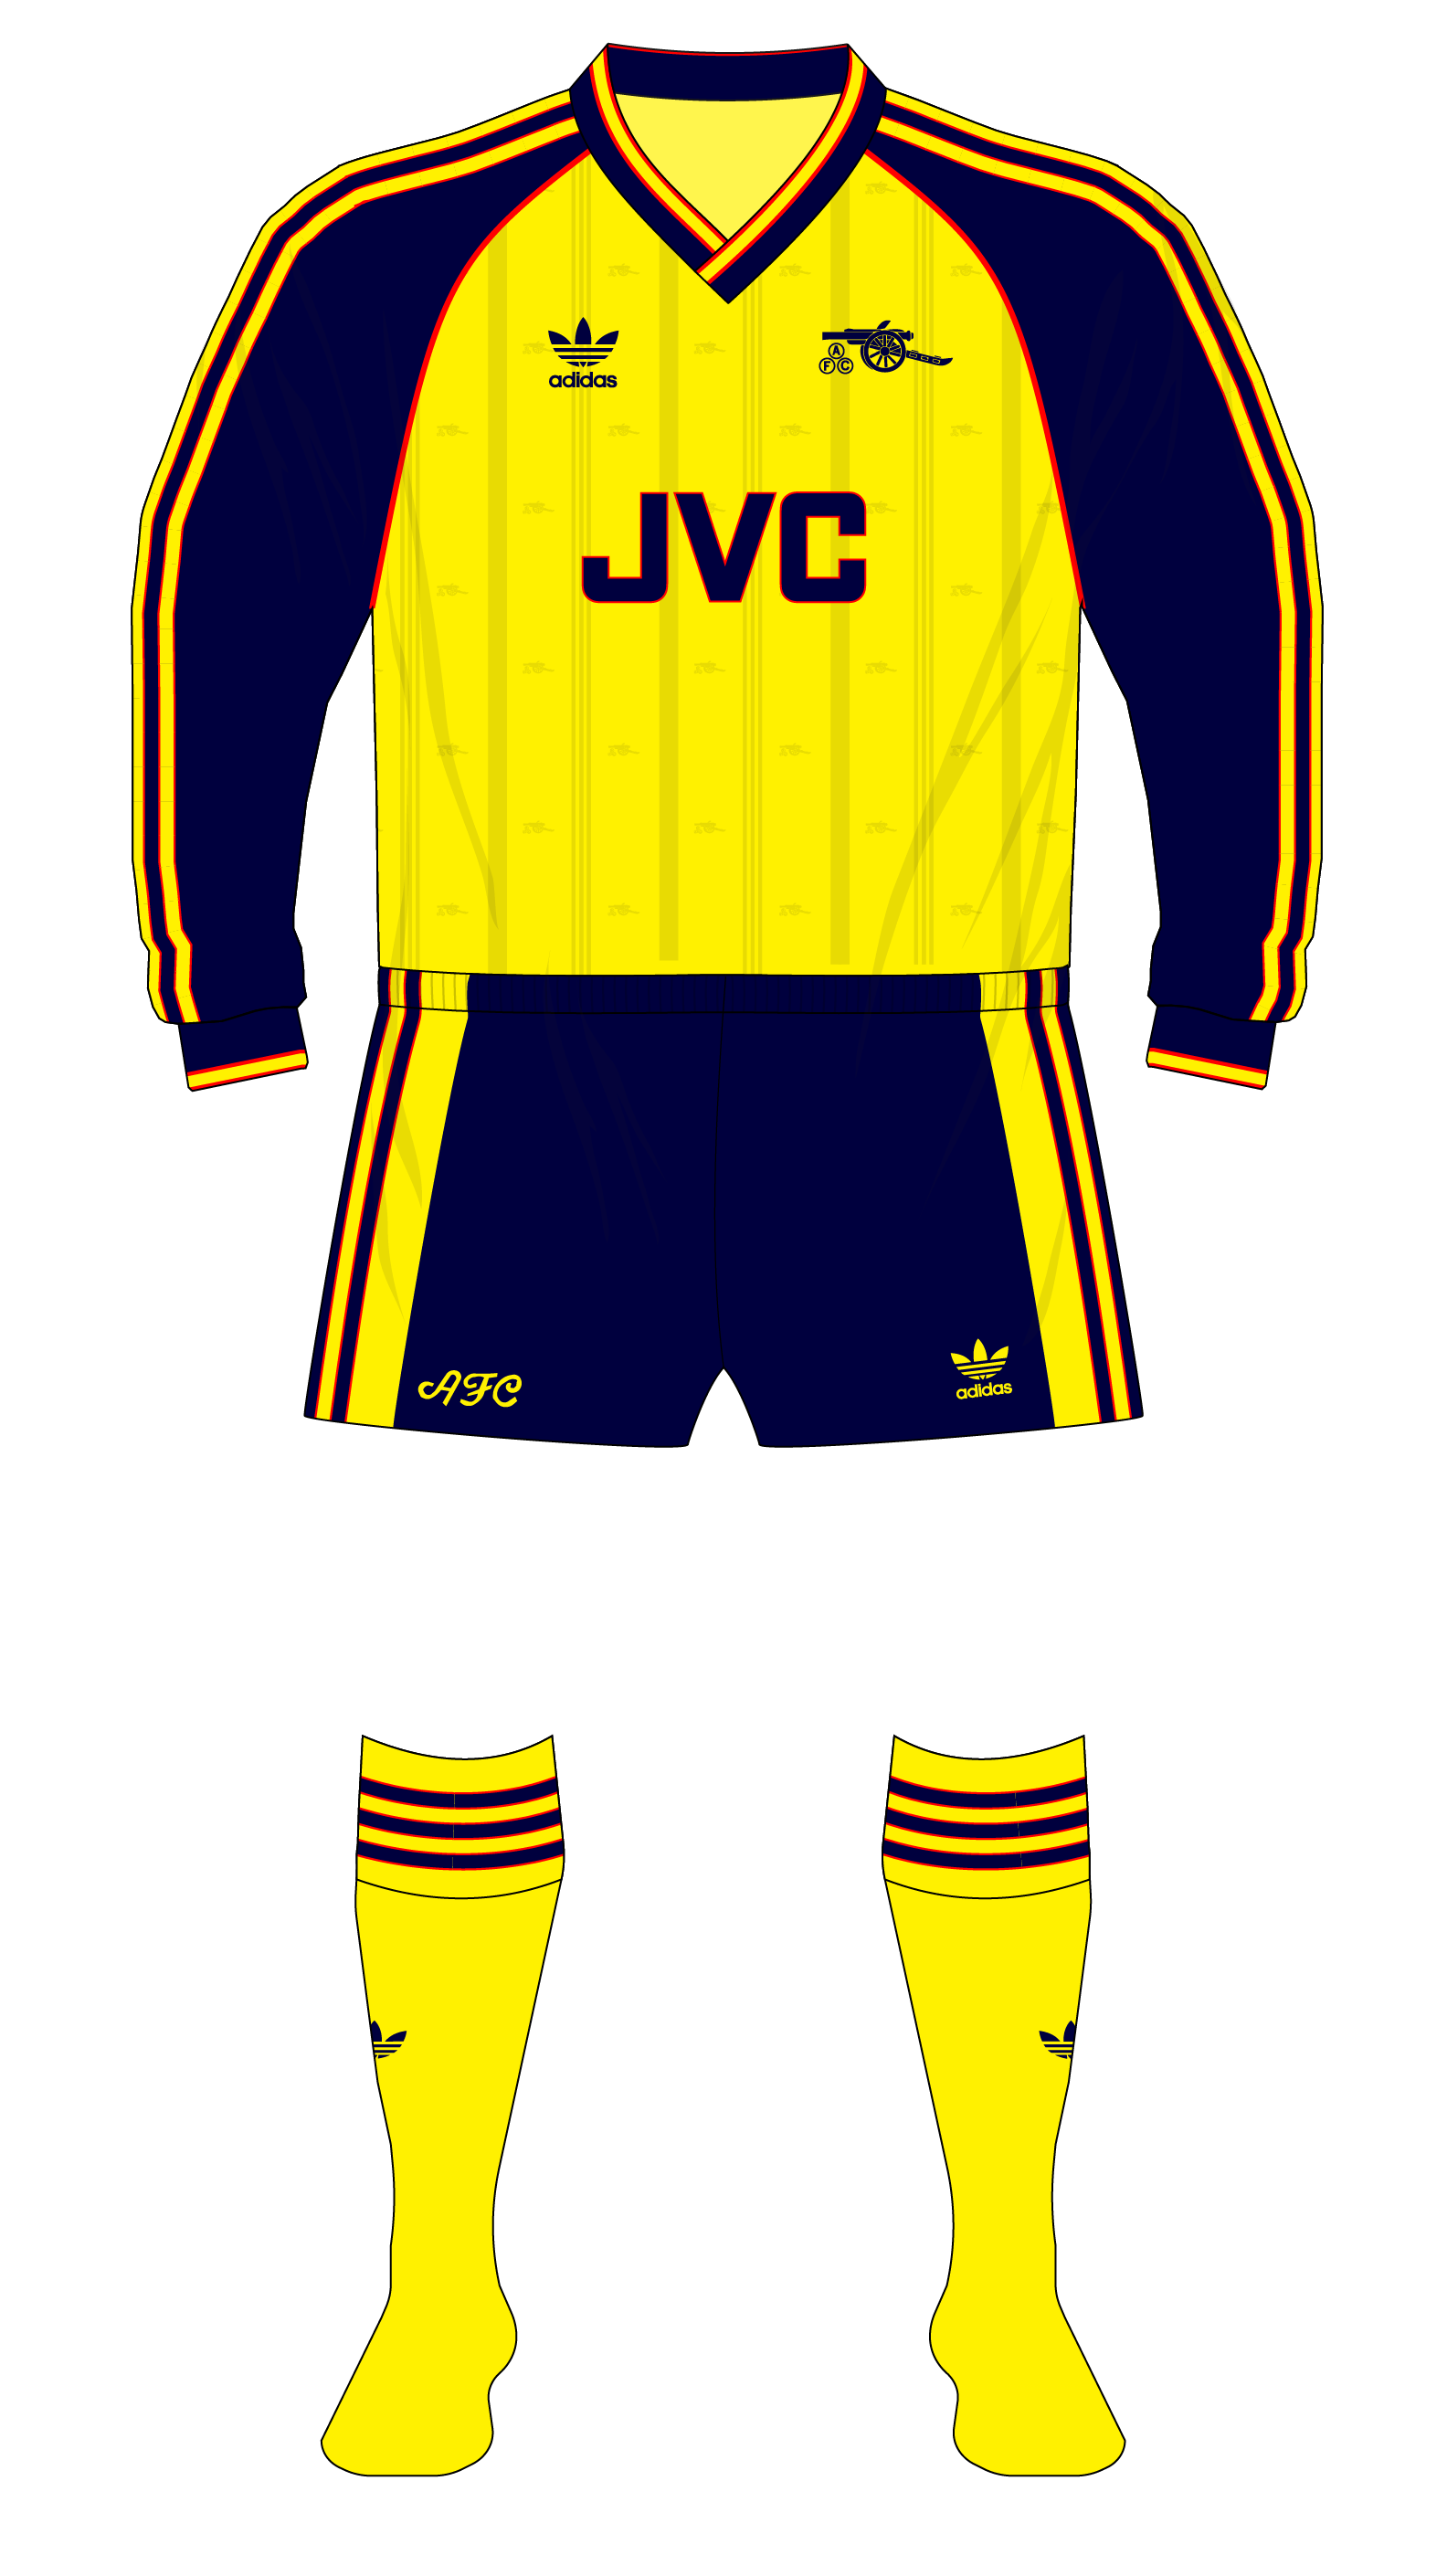 sale retailer bbc03 b3e53 Arsenal-1988-1991-adidas-away-kit-long-sleeves-France-01 ...